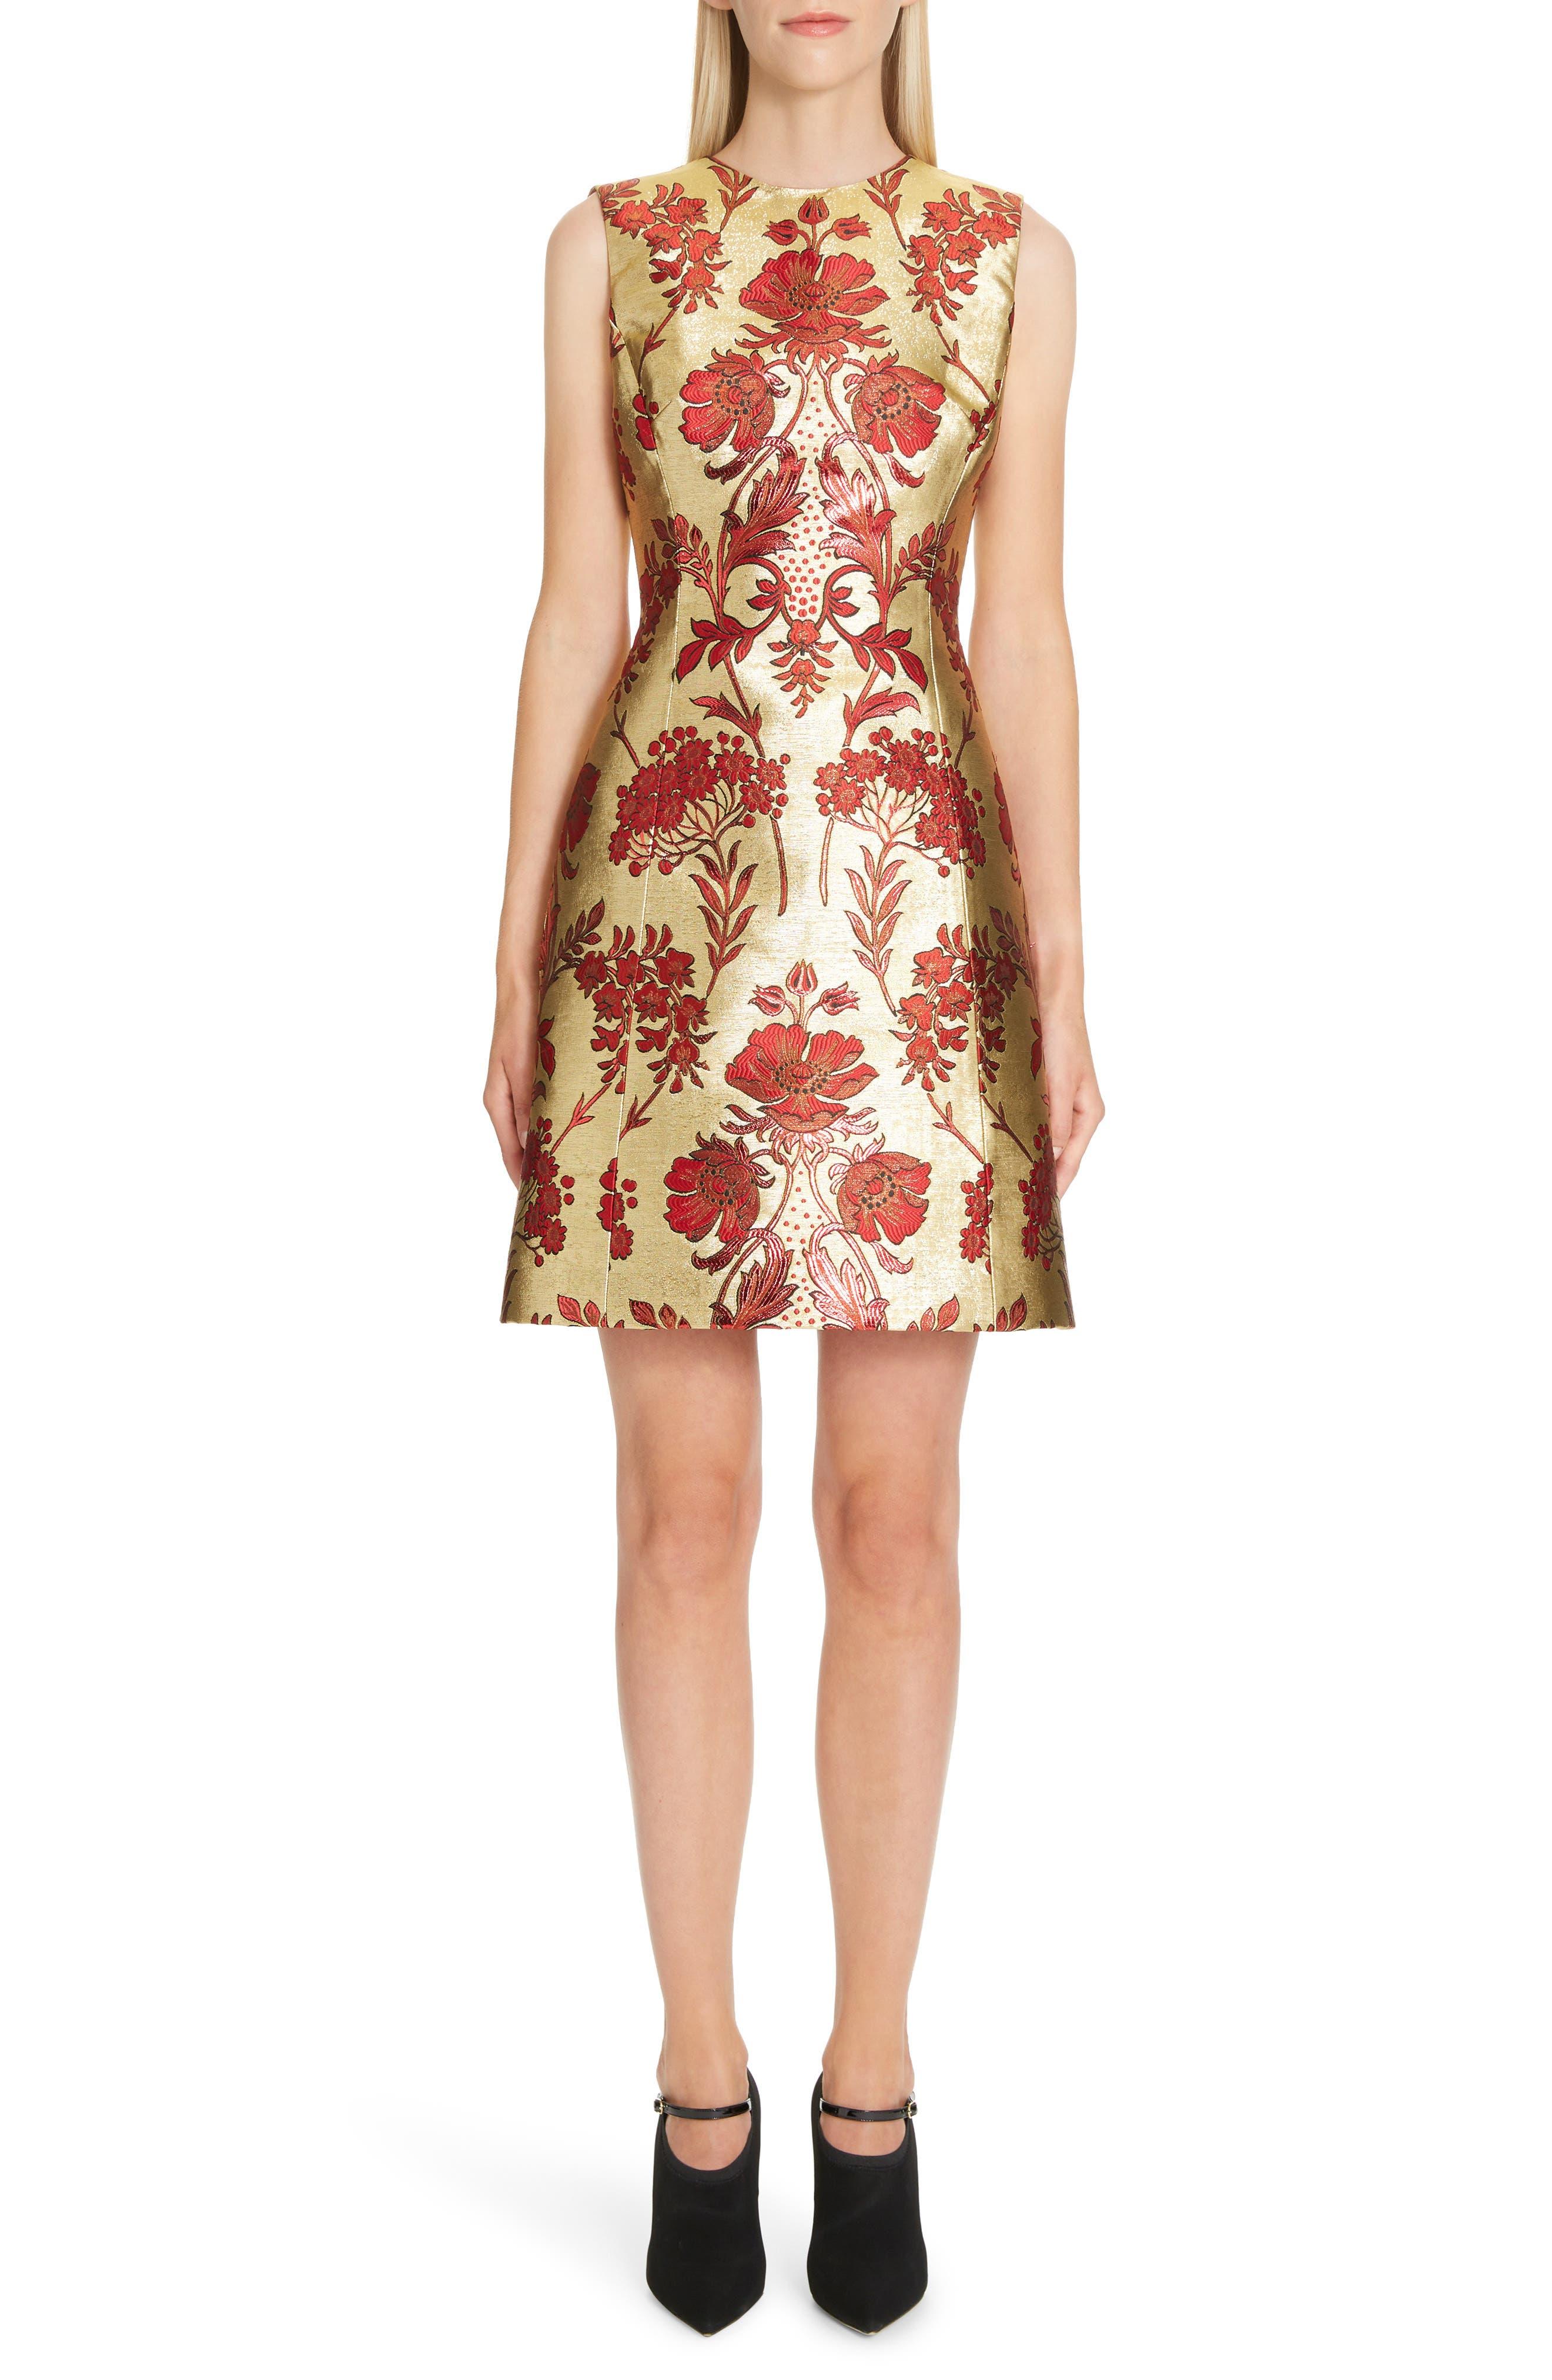 Metallic Jacquard A-Line Dress,                             Main thumbnail 1, color,                             S8351 JACQUARD LUREX FLORAL